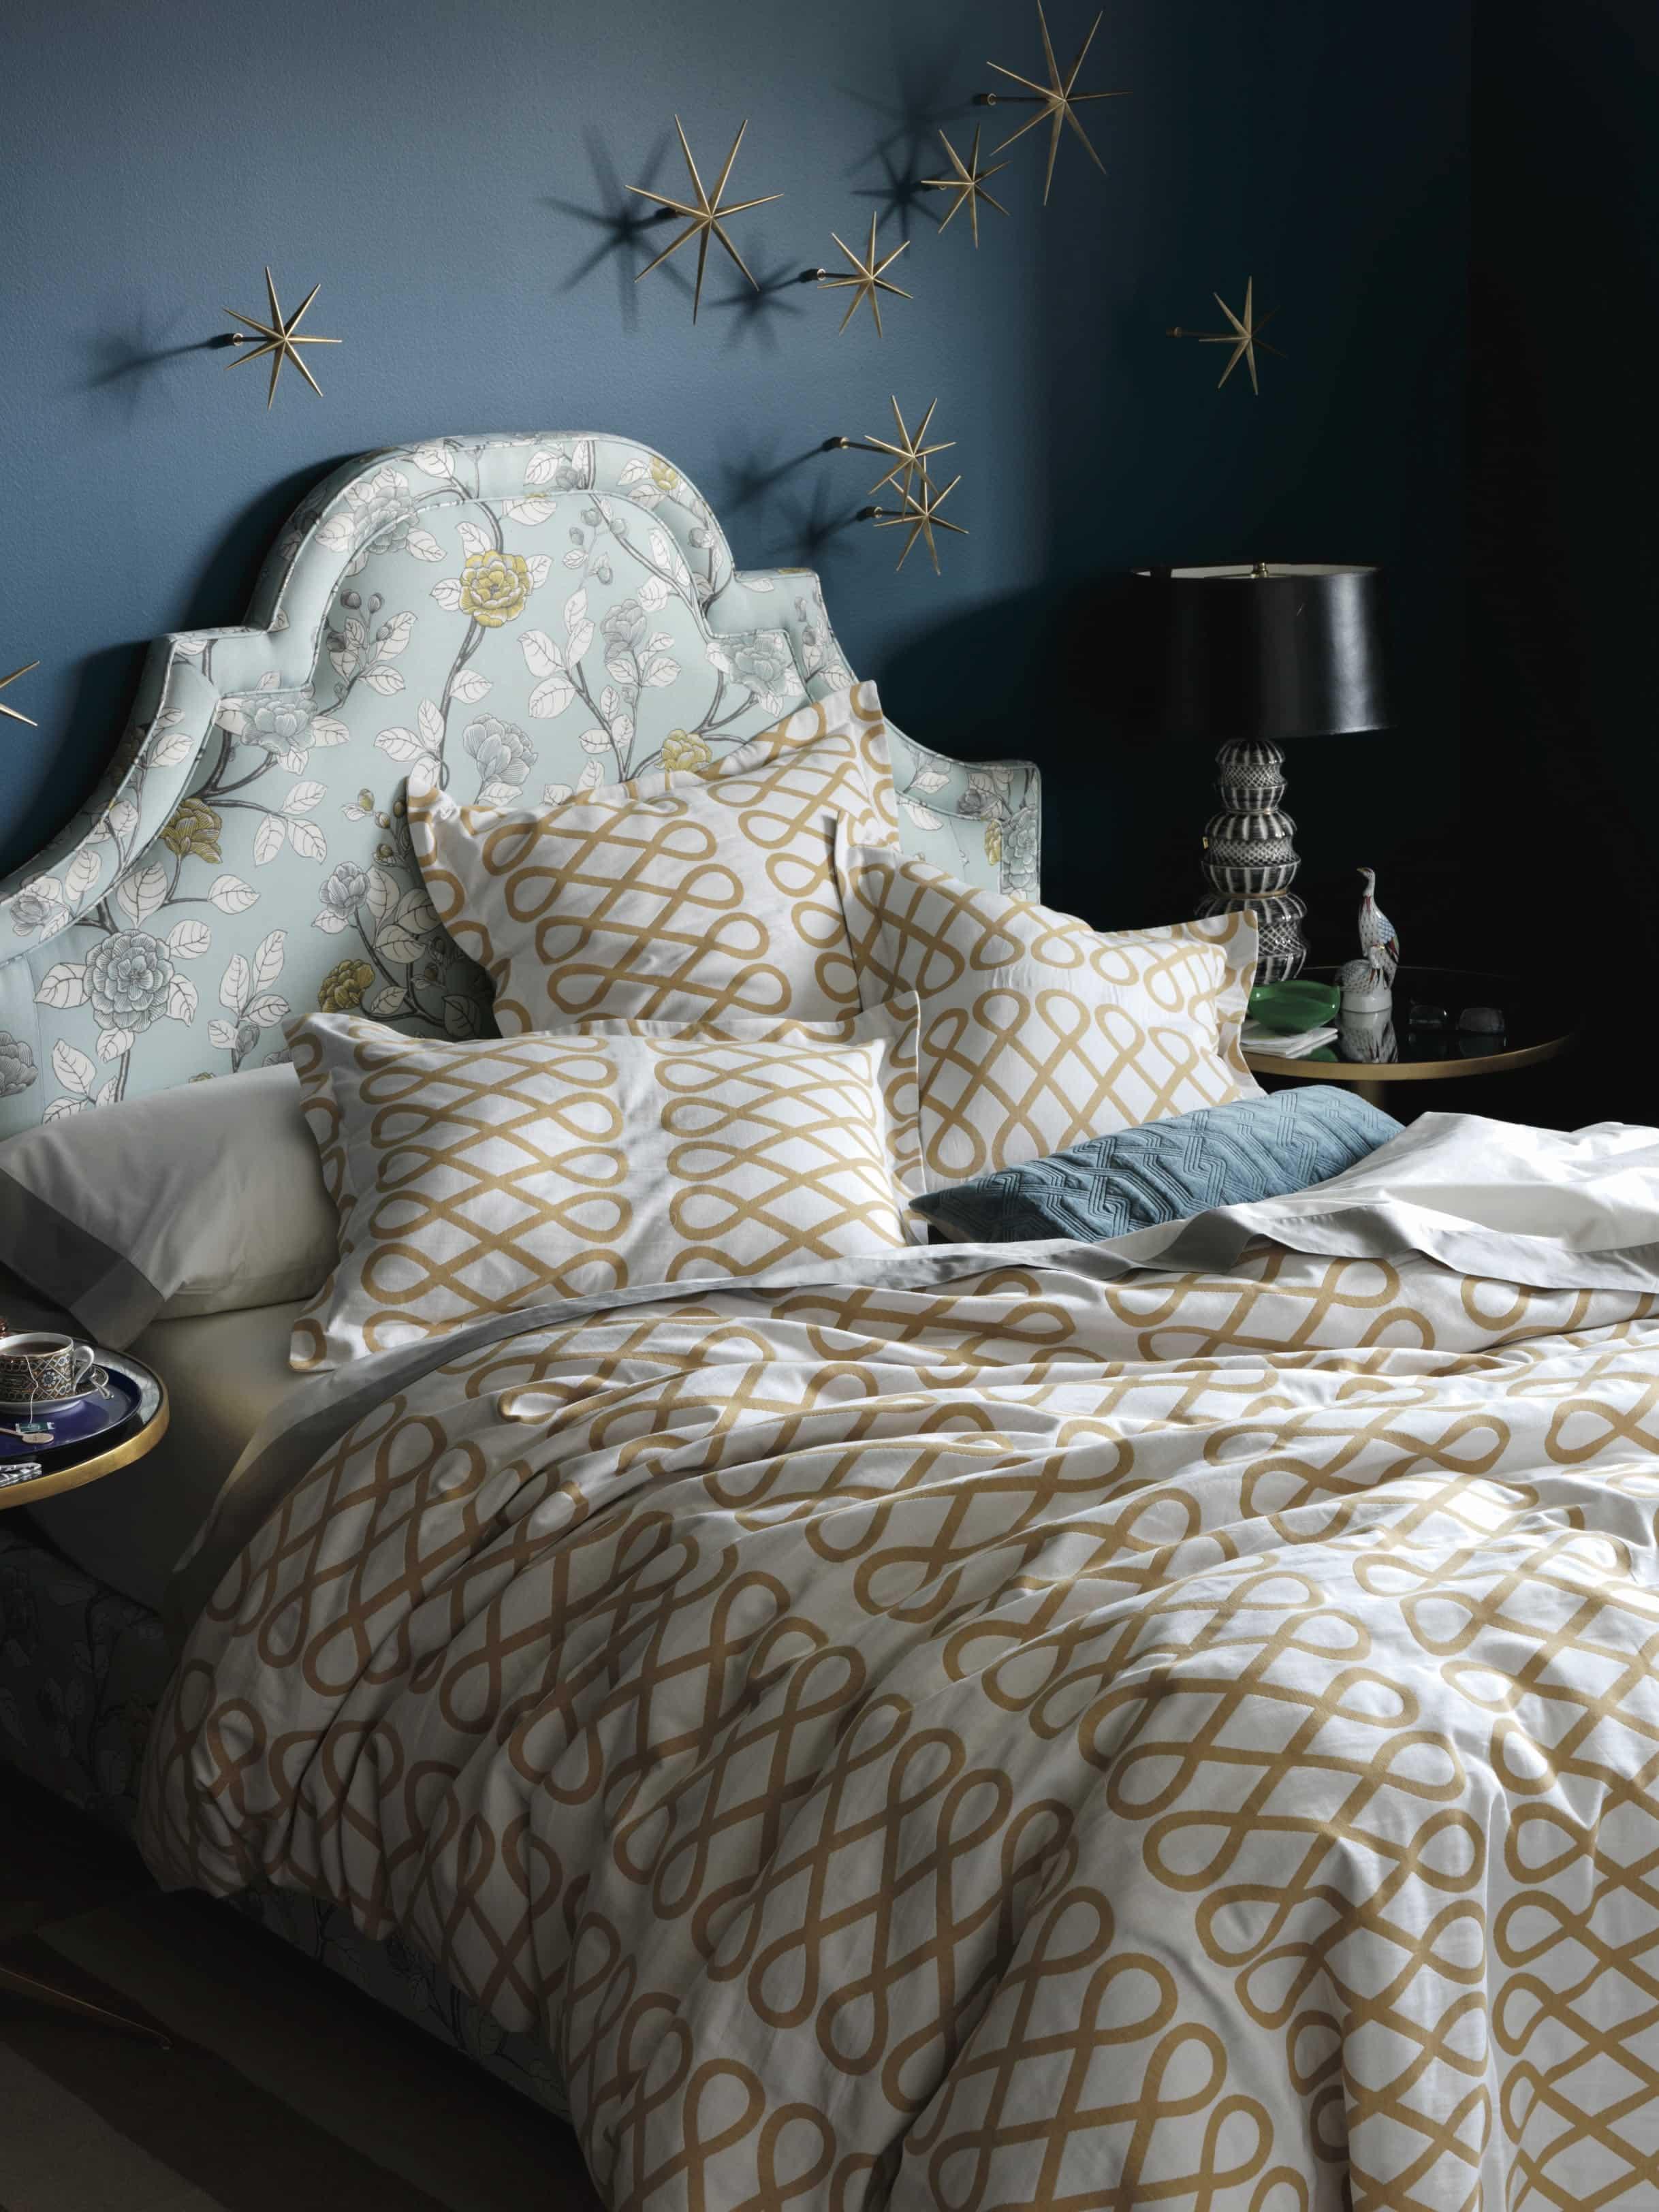 wayfair allmodern wayfair all modern  house interior and  - new cococozy bedding collection all modern wayfair cococozy